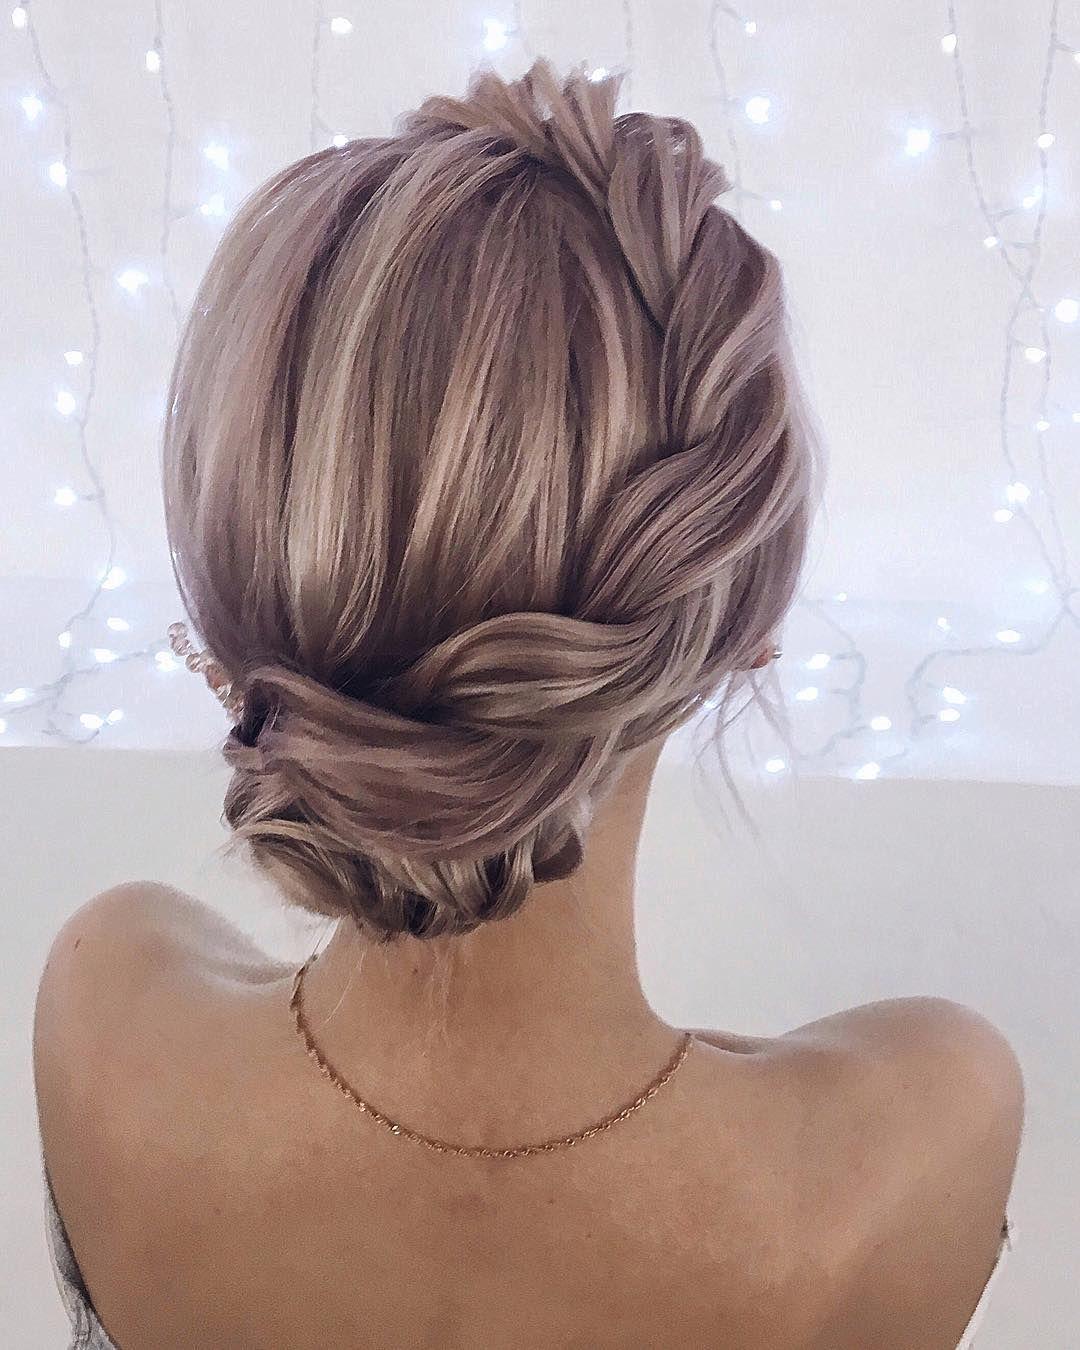 Updo bridal hairstyles ,Unique wedding hair ideas to inspire you #weddinghair #hairideas #hairdo #weddings #updo #weddinghairstyles#bridalhair